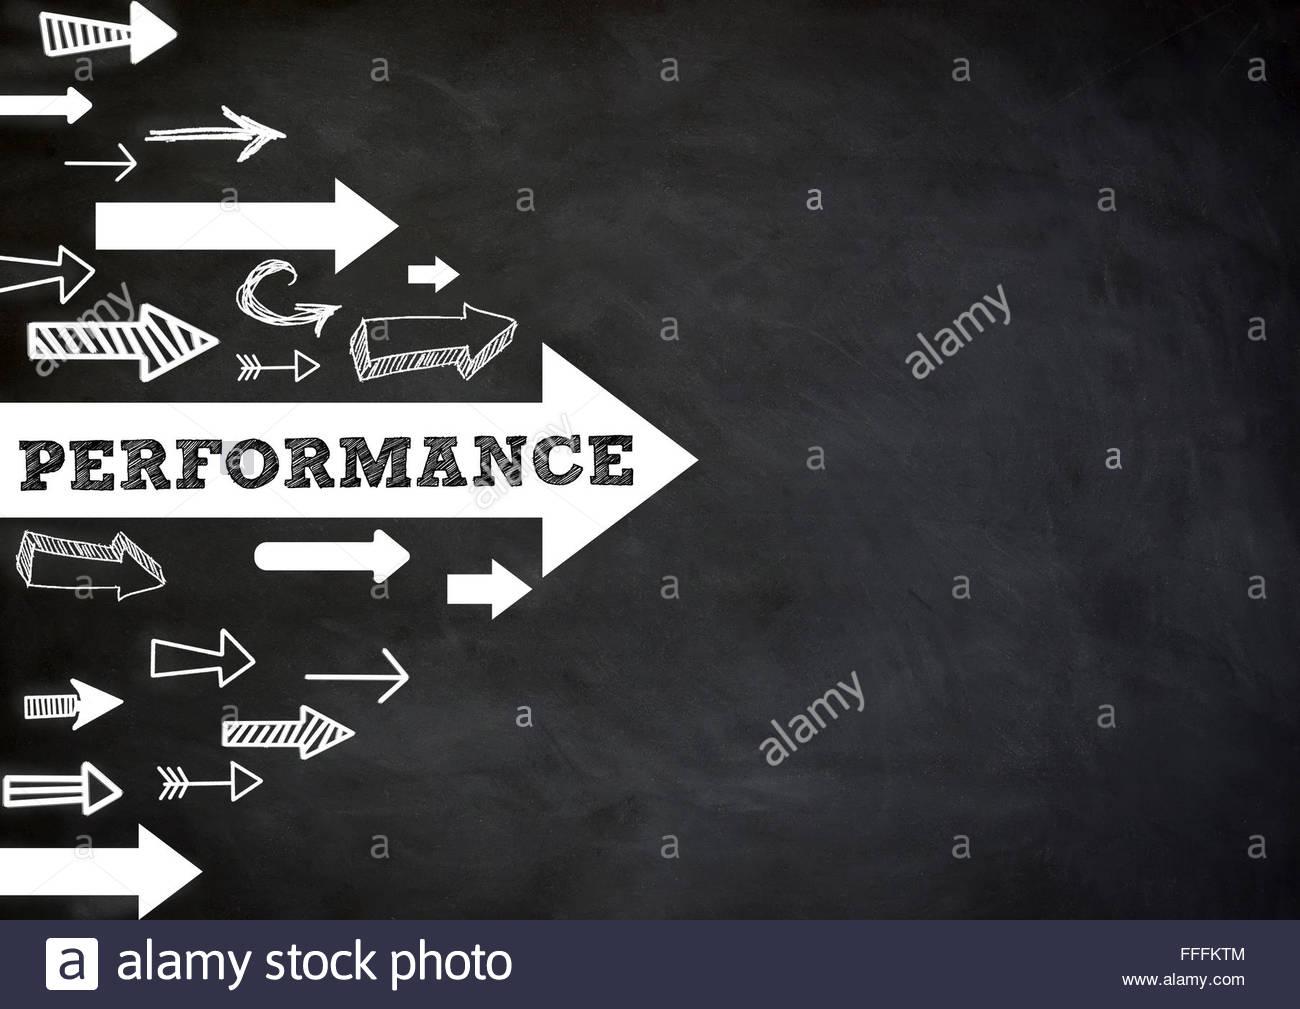 Performance - direction Photo Stock